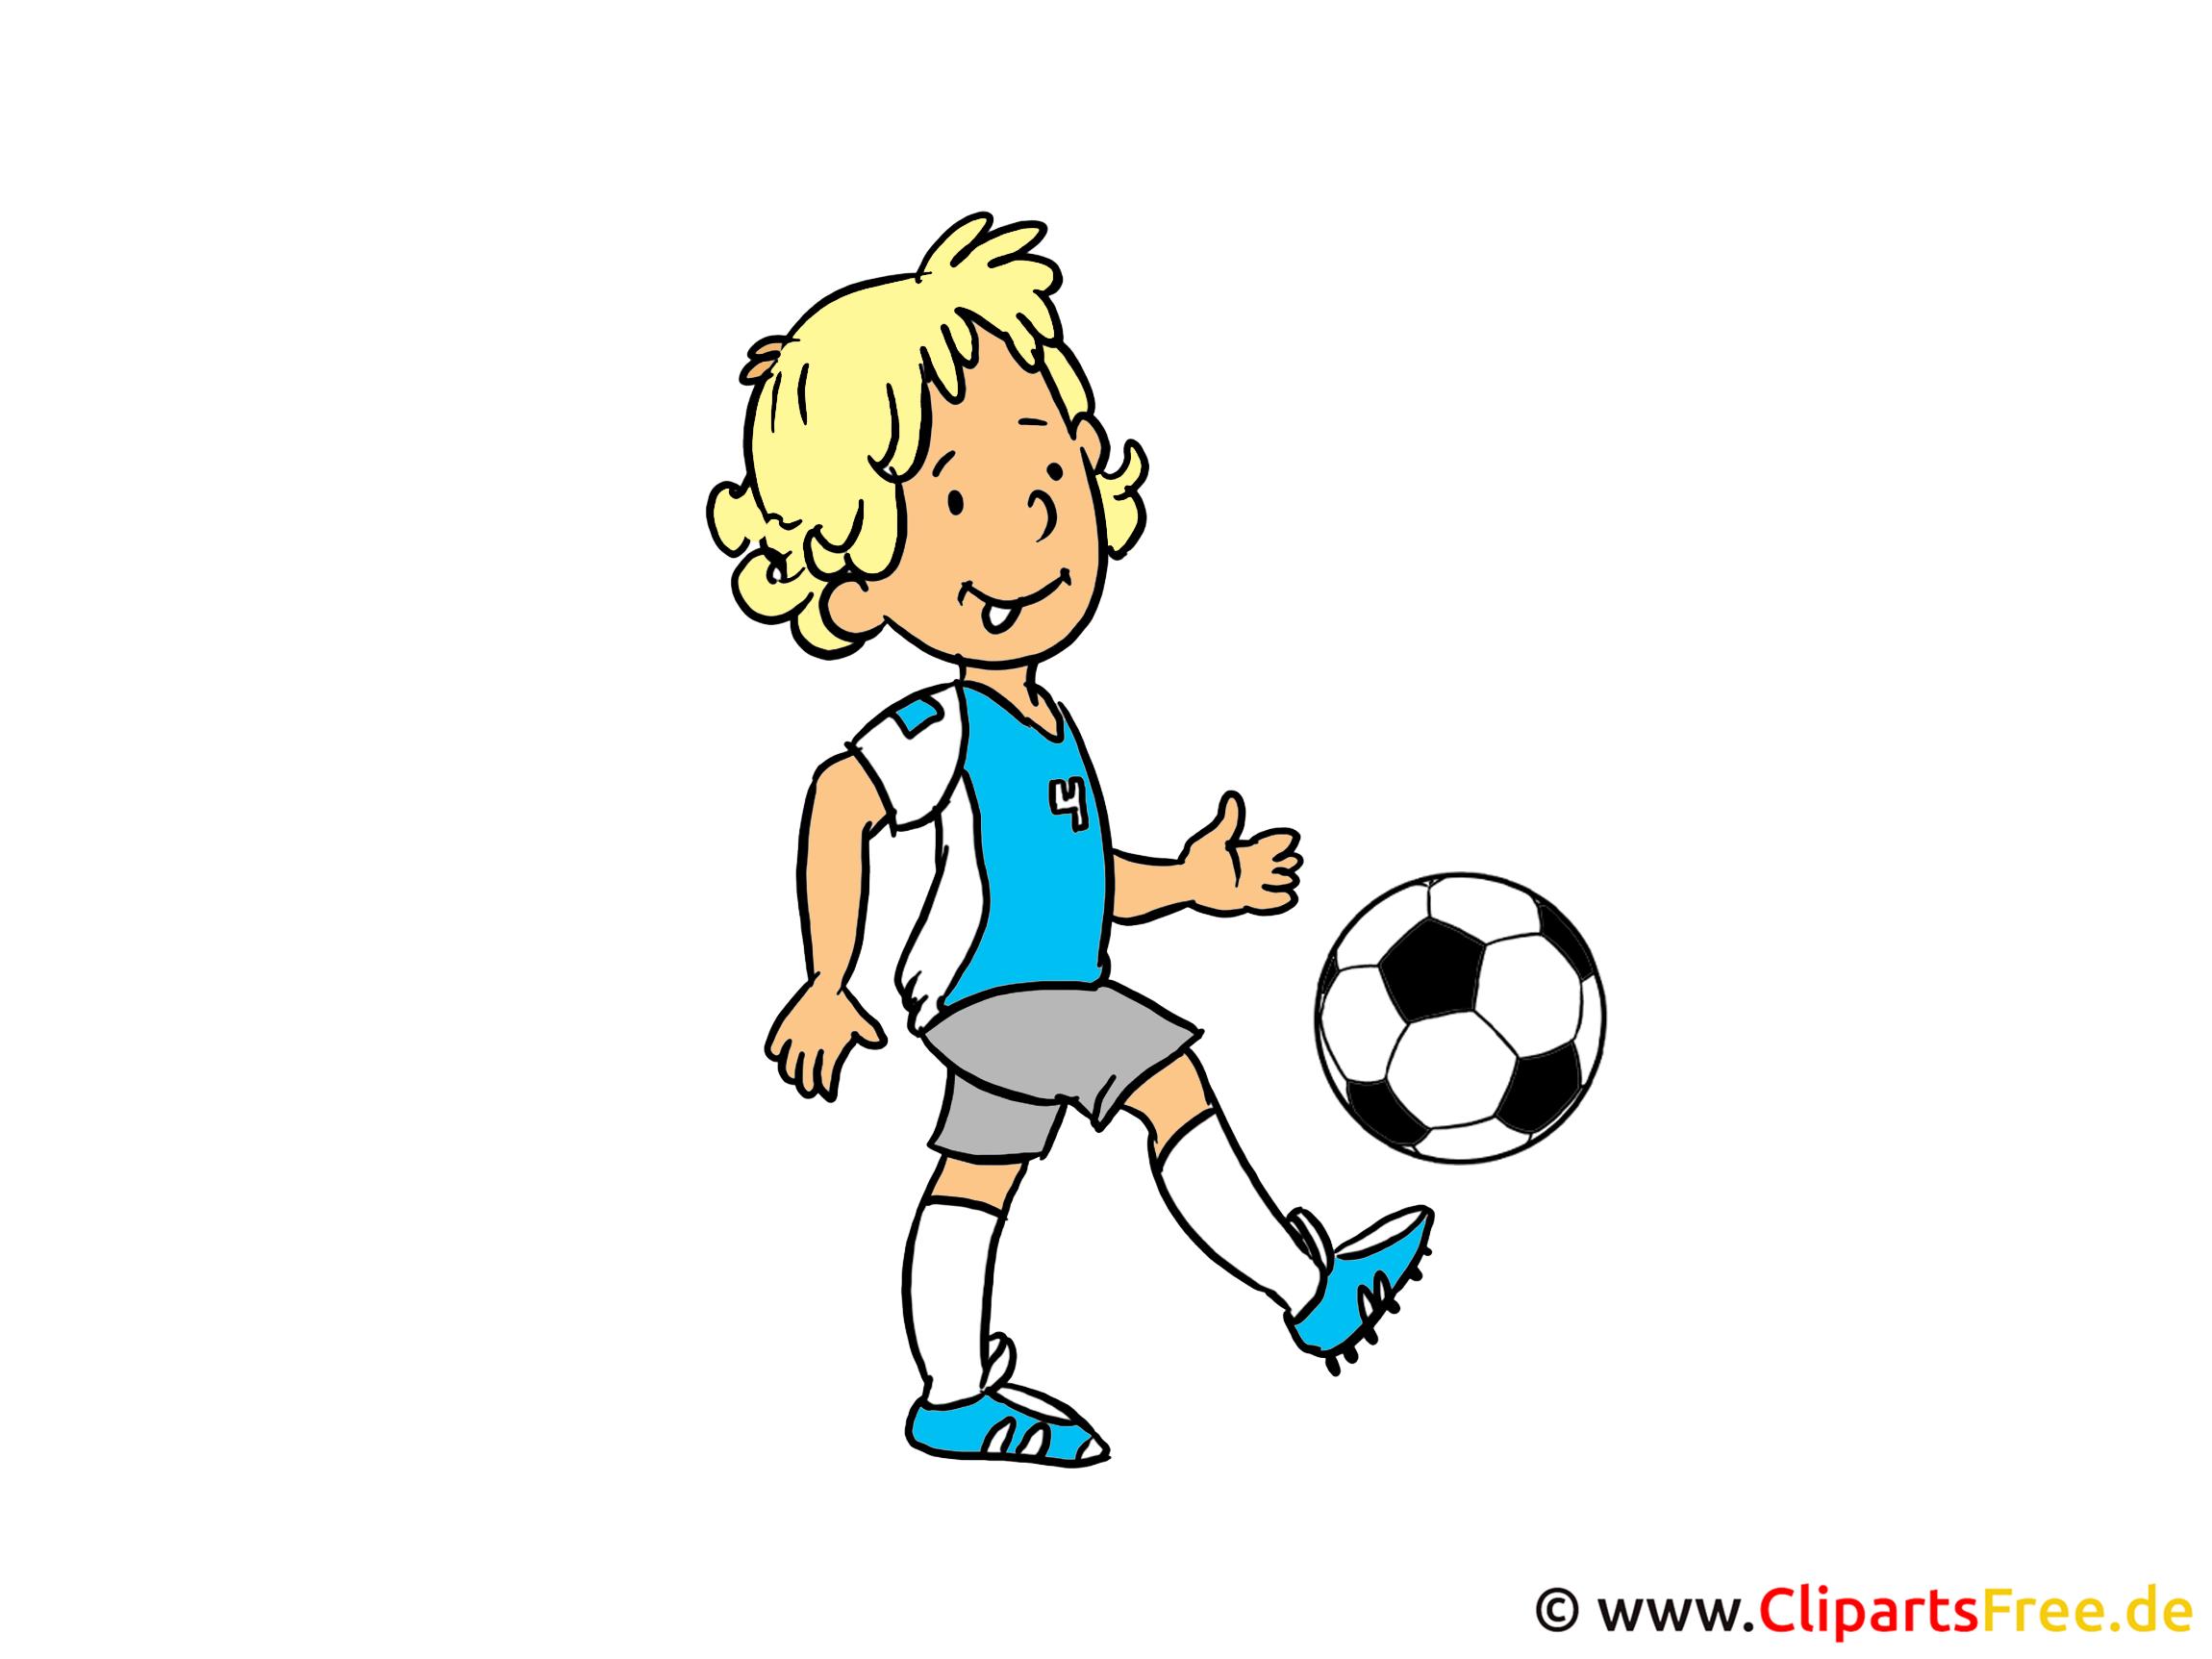 Fußball Comic Bilder